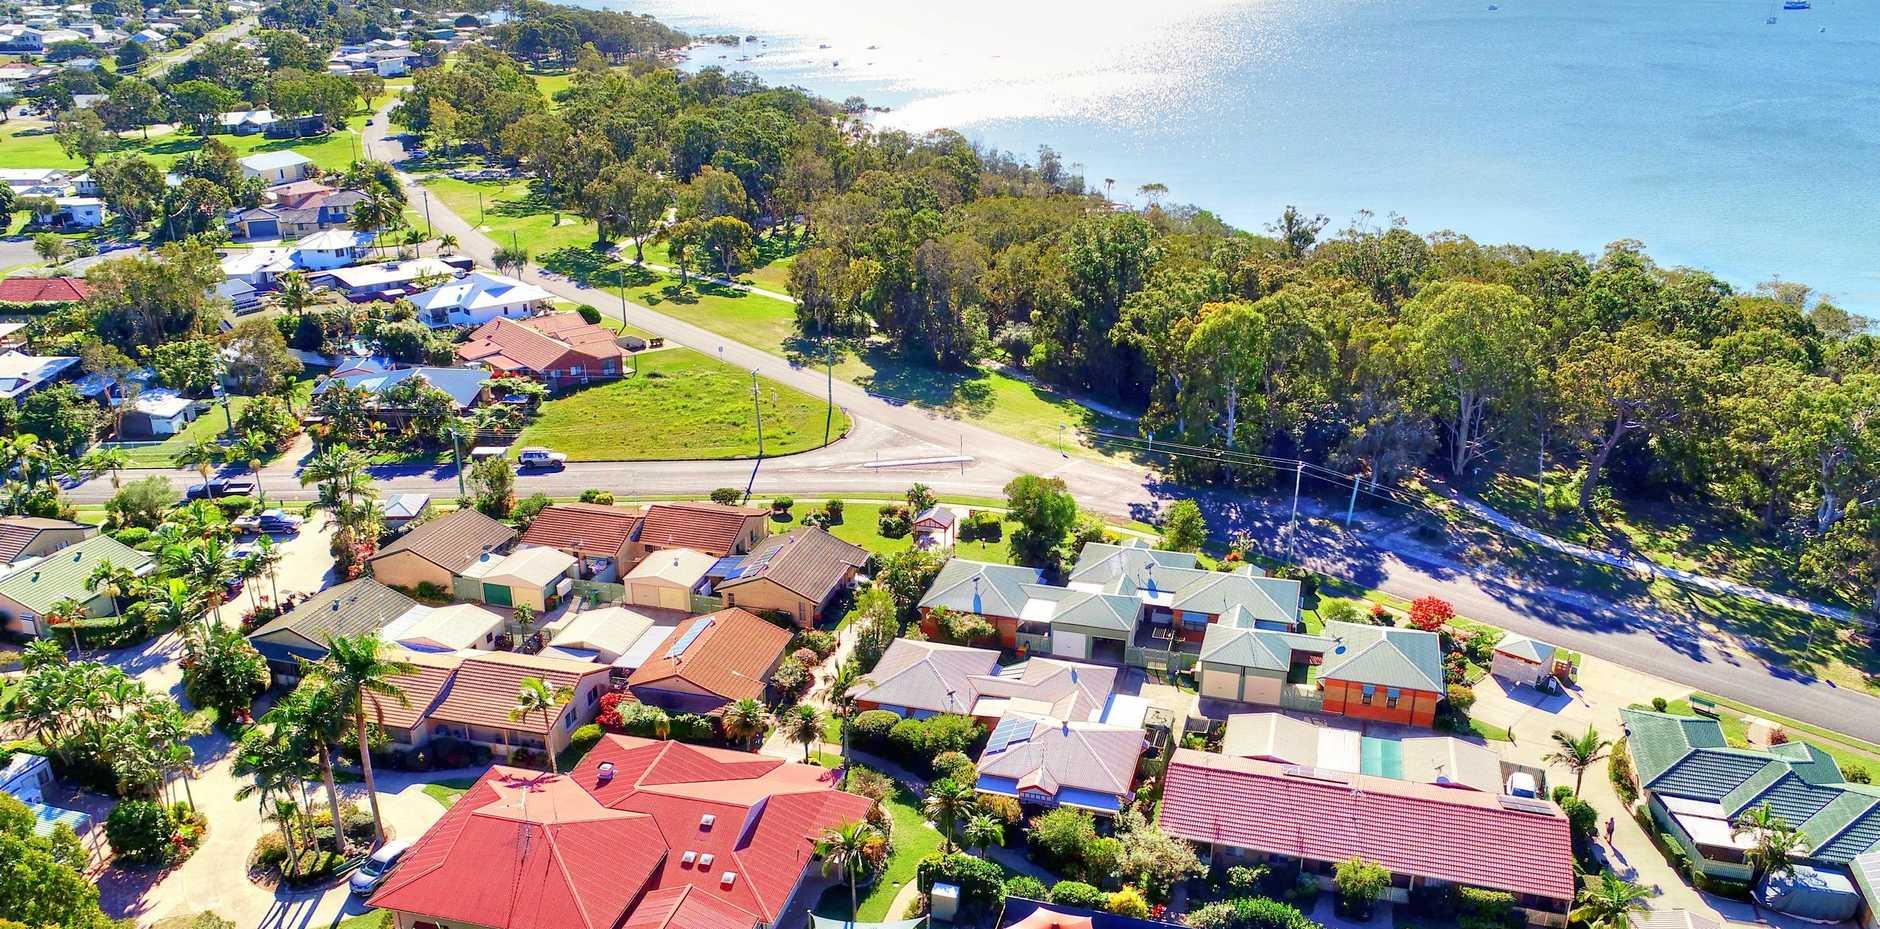 Ian Pye Real Estate Cooloola Waters Resort Tin Can Bay